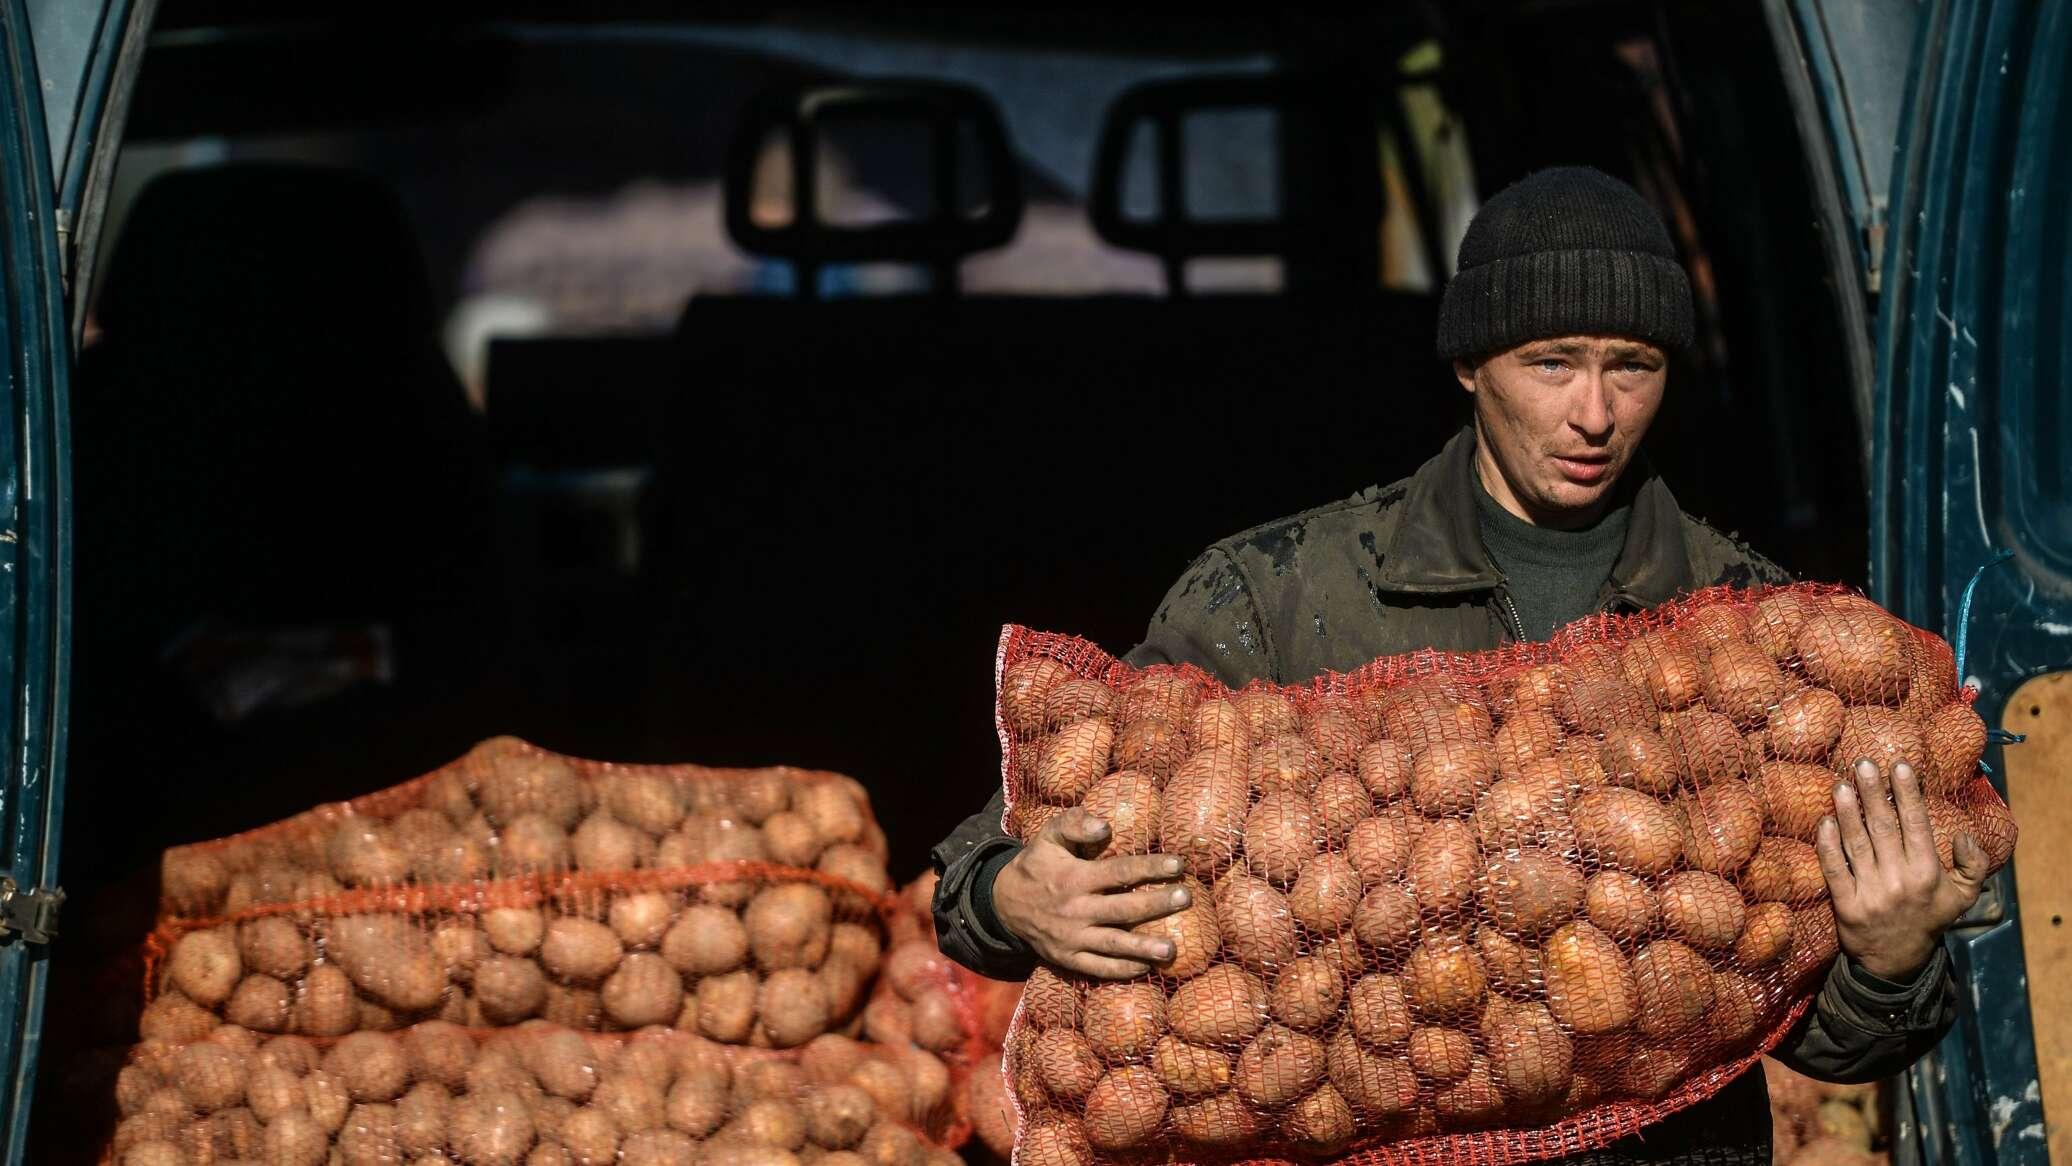 ДНР и ЛНР снизили ставки ввозных пошлин на овощи в 3-5 раз